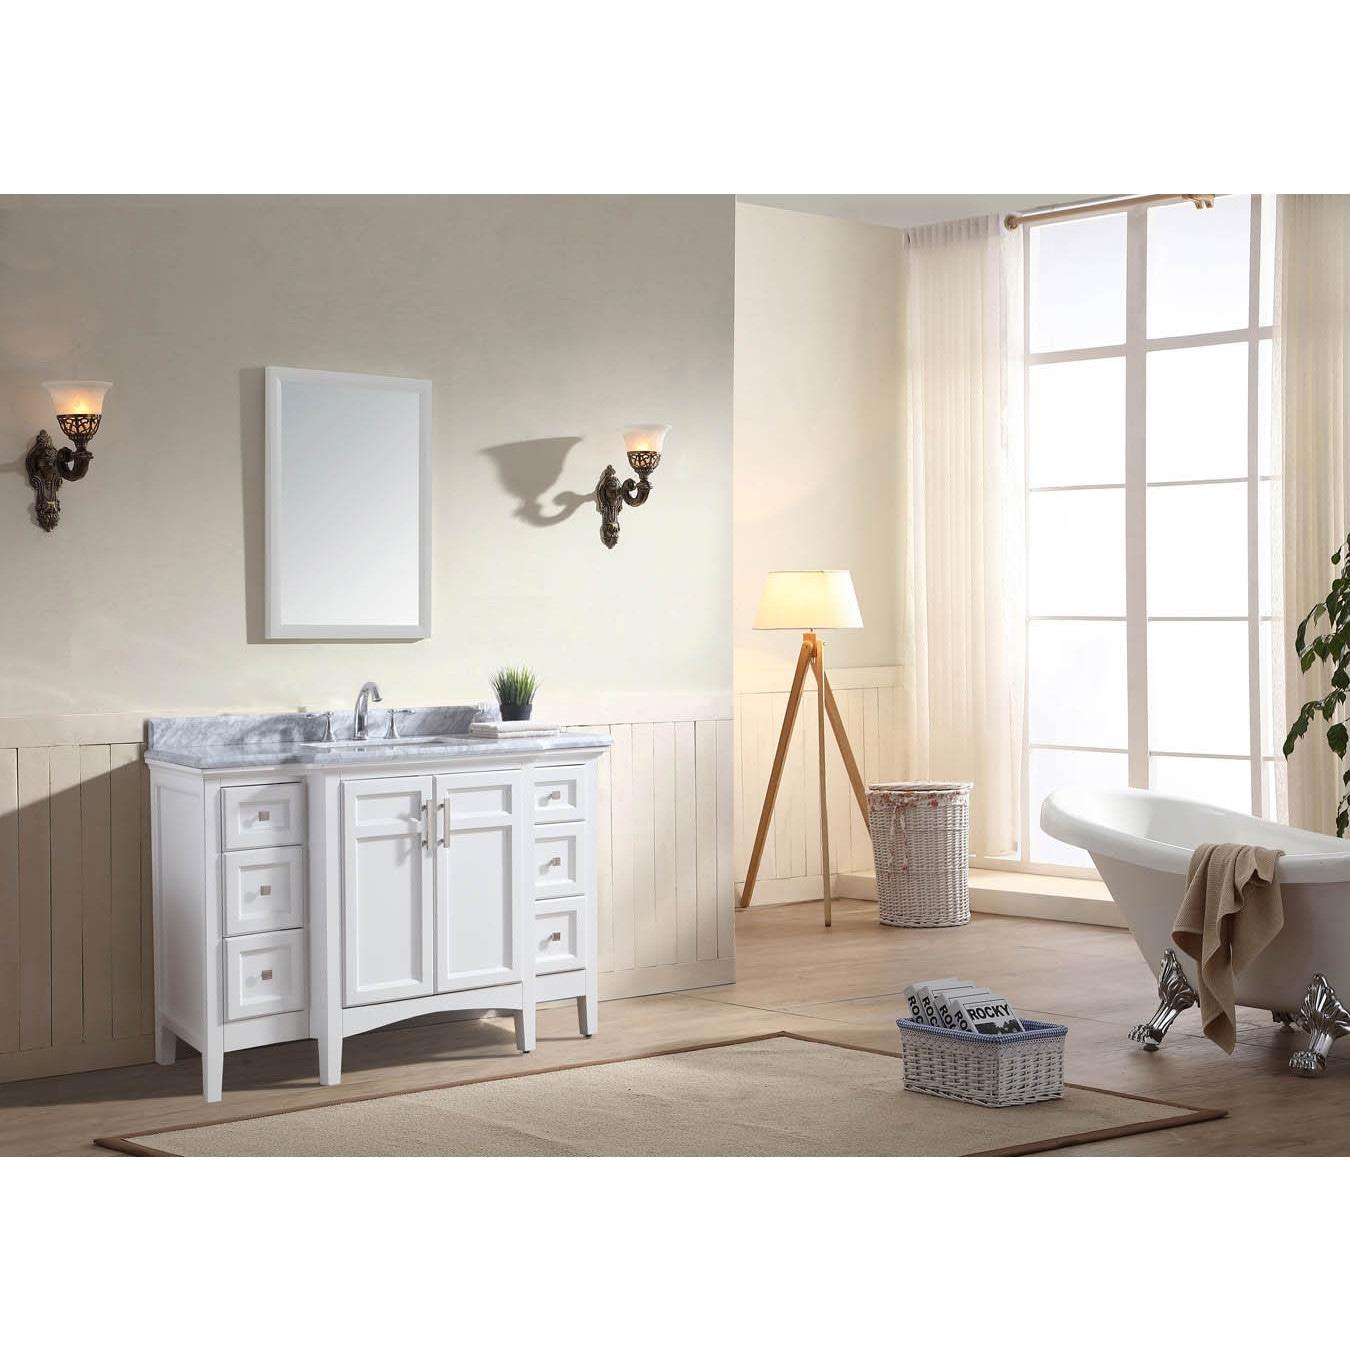 Ari Kitchen And Bath Luz 48 Single Bathroom Vanity Set White Overstock 13535454